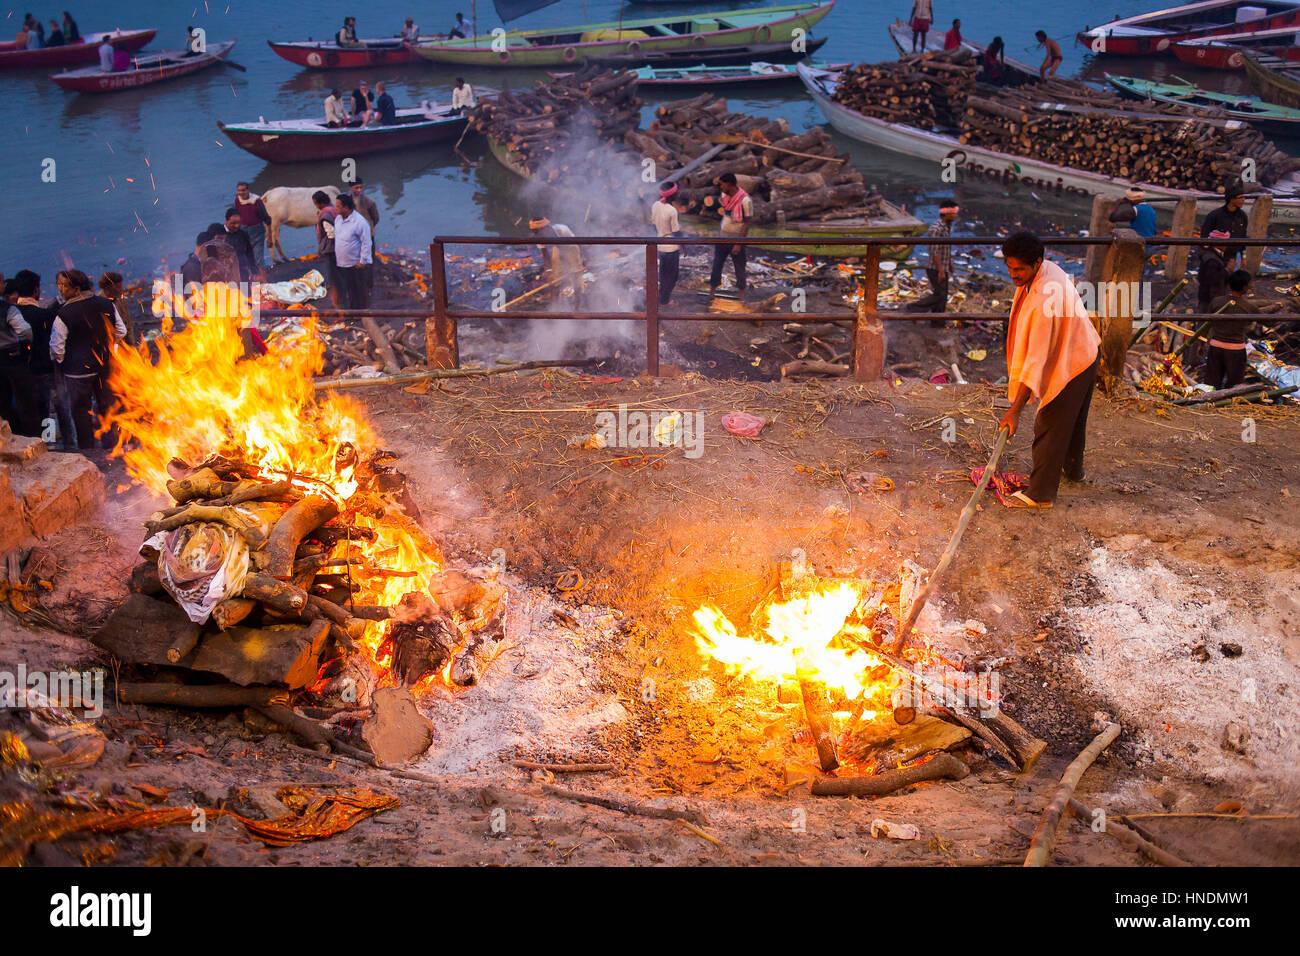 Cremation of bodies, in Manikarnika Ghat, the burning ghat, on the banks of Ganges river, Varanasi, Uttar Pradesh, - Stock Image